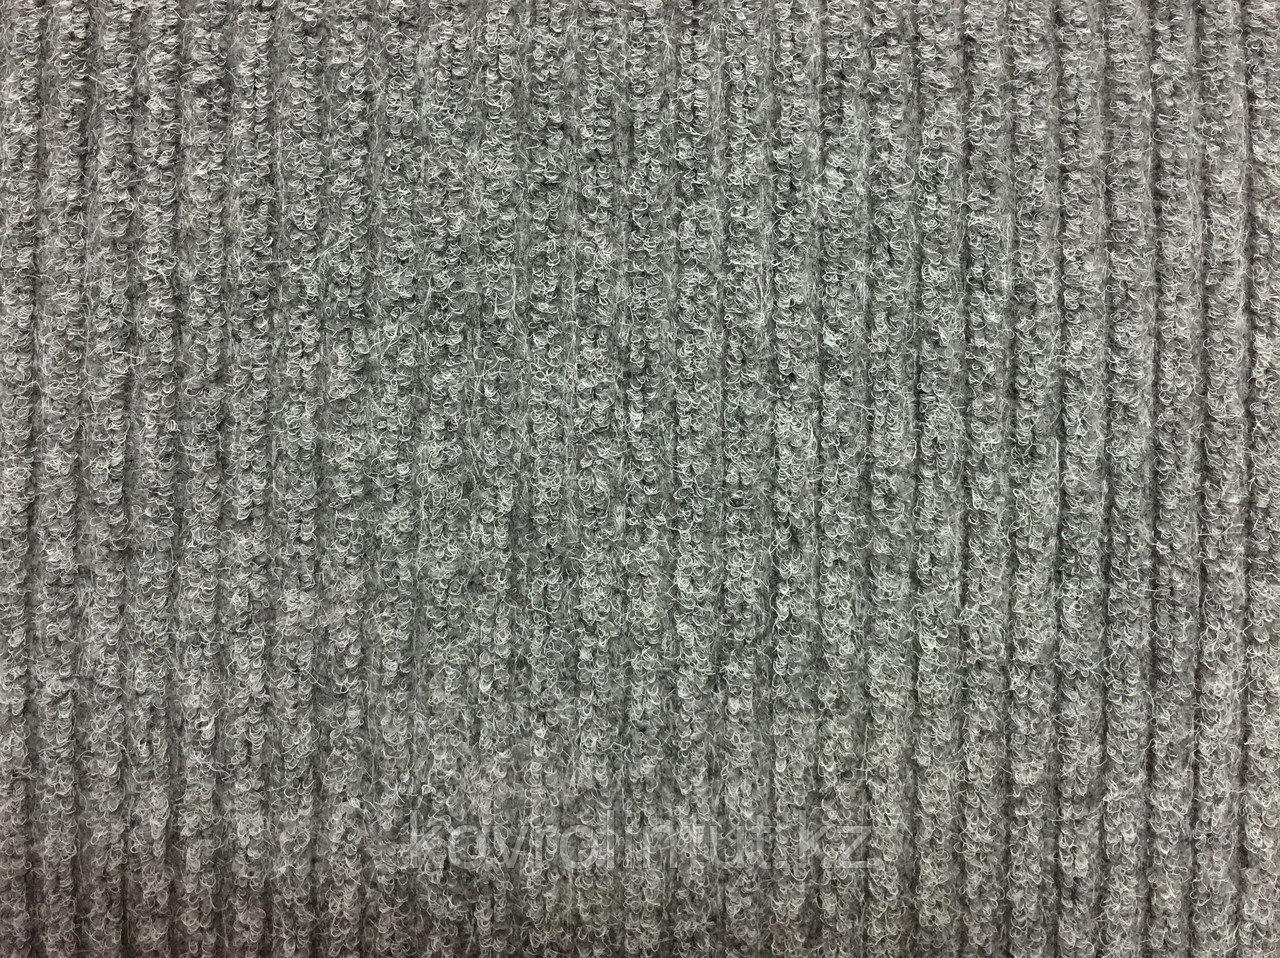 Ковролин Аликанте серый, 4м, опт/розн